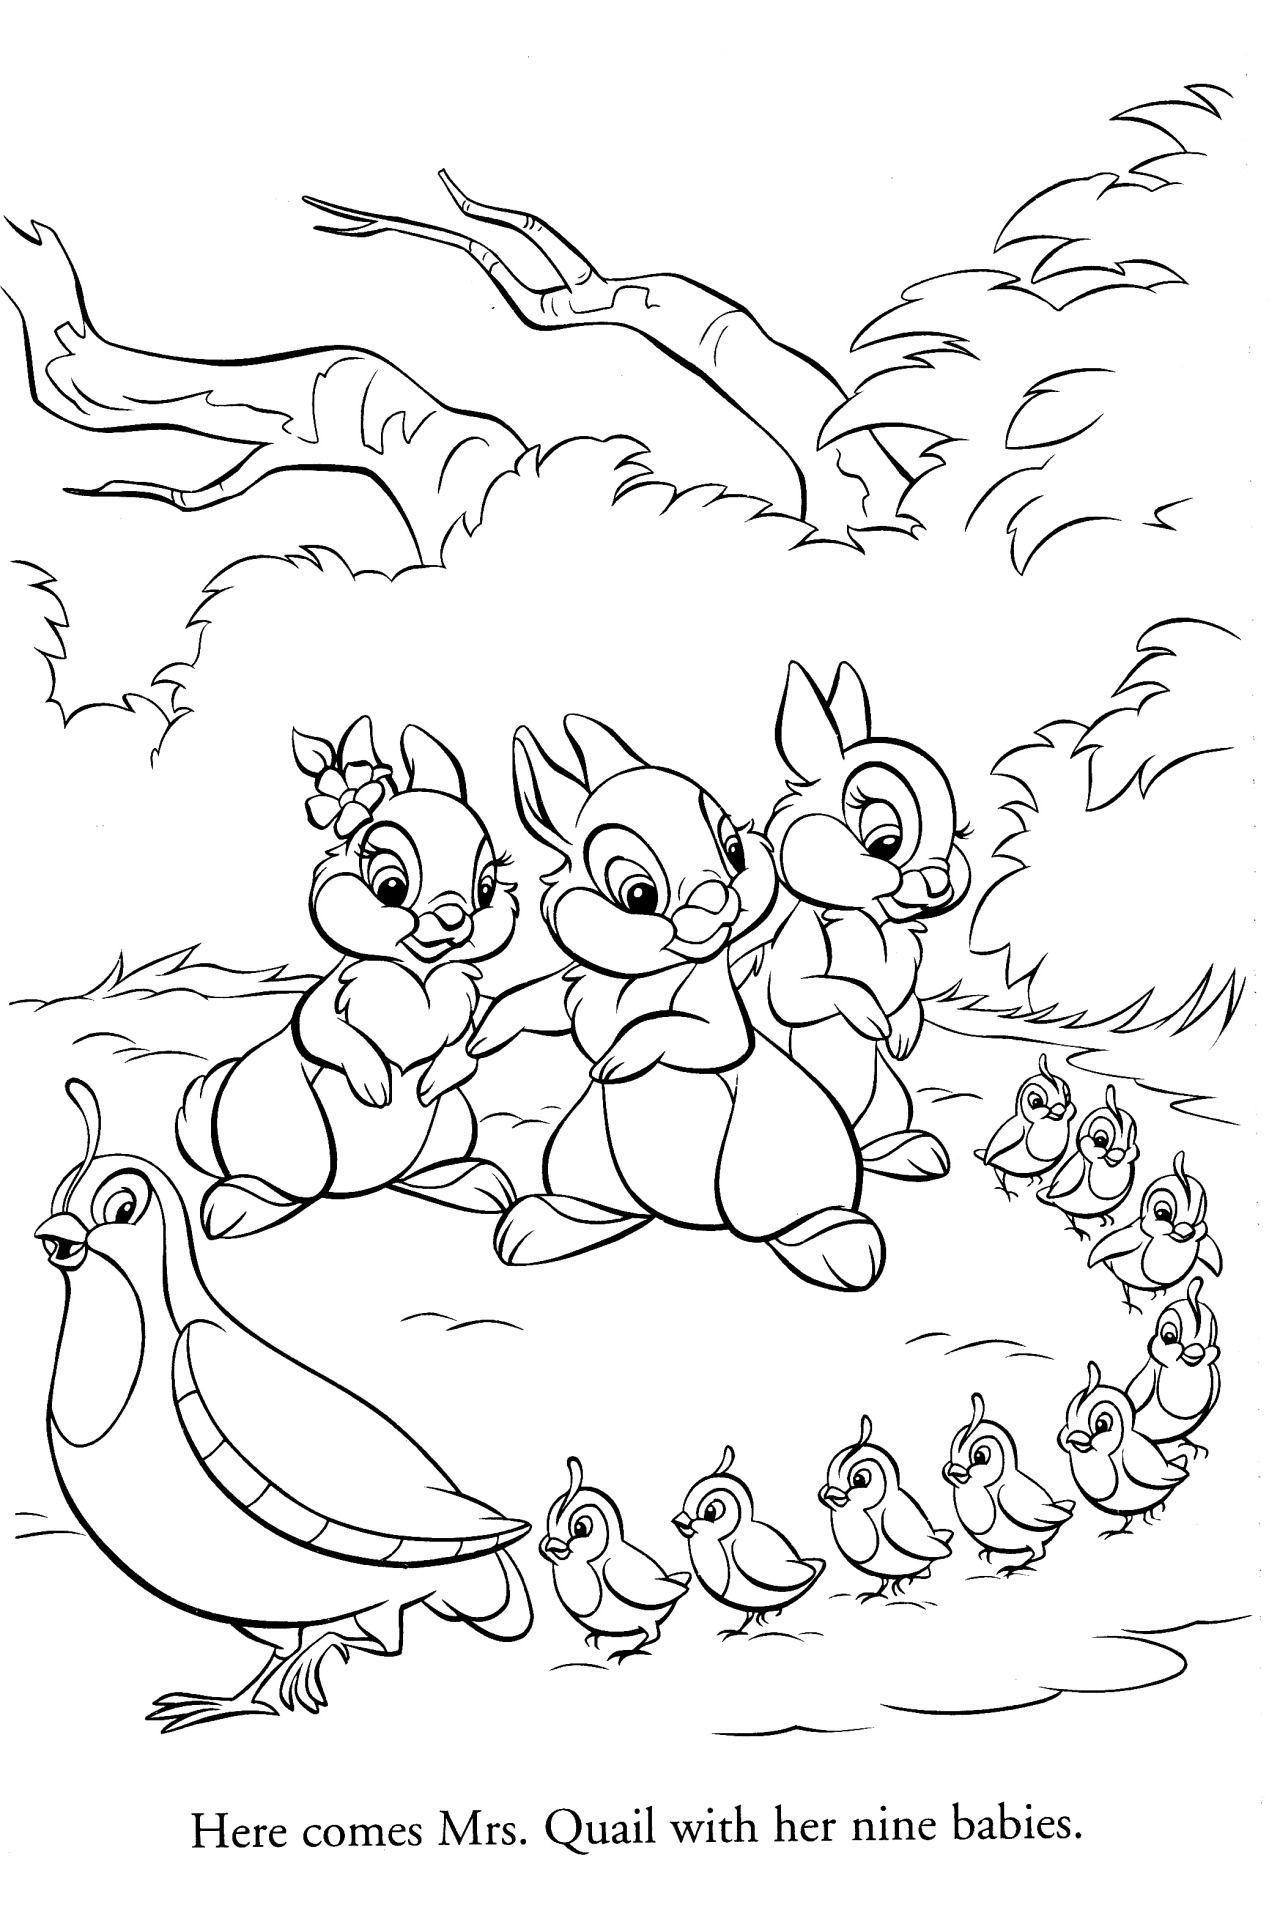 Disney Coloring Pages Disegni Disegni Bambini Bambi E Disegni